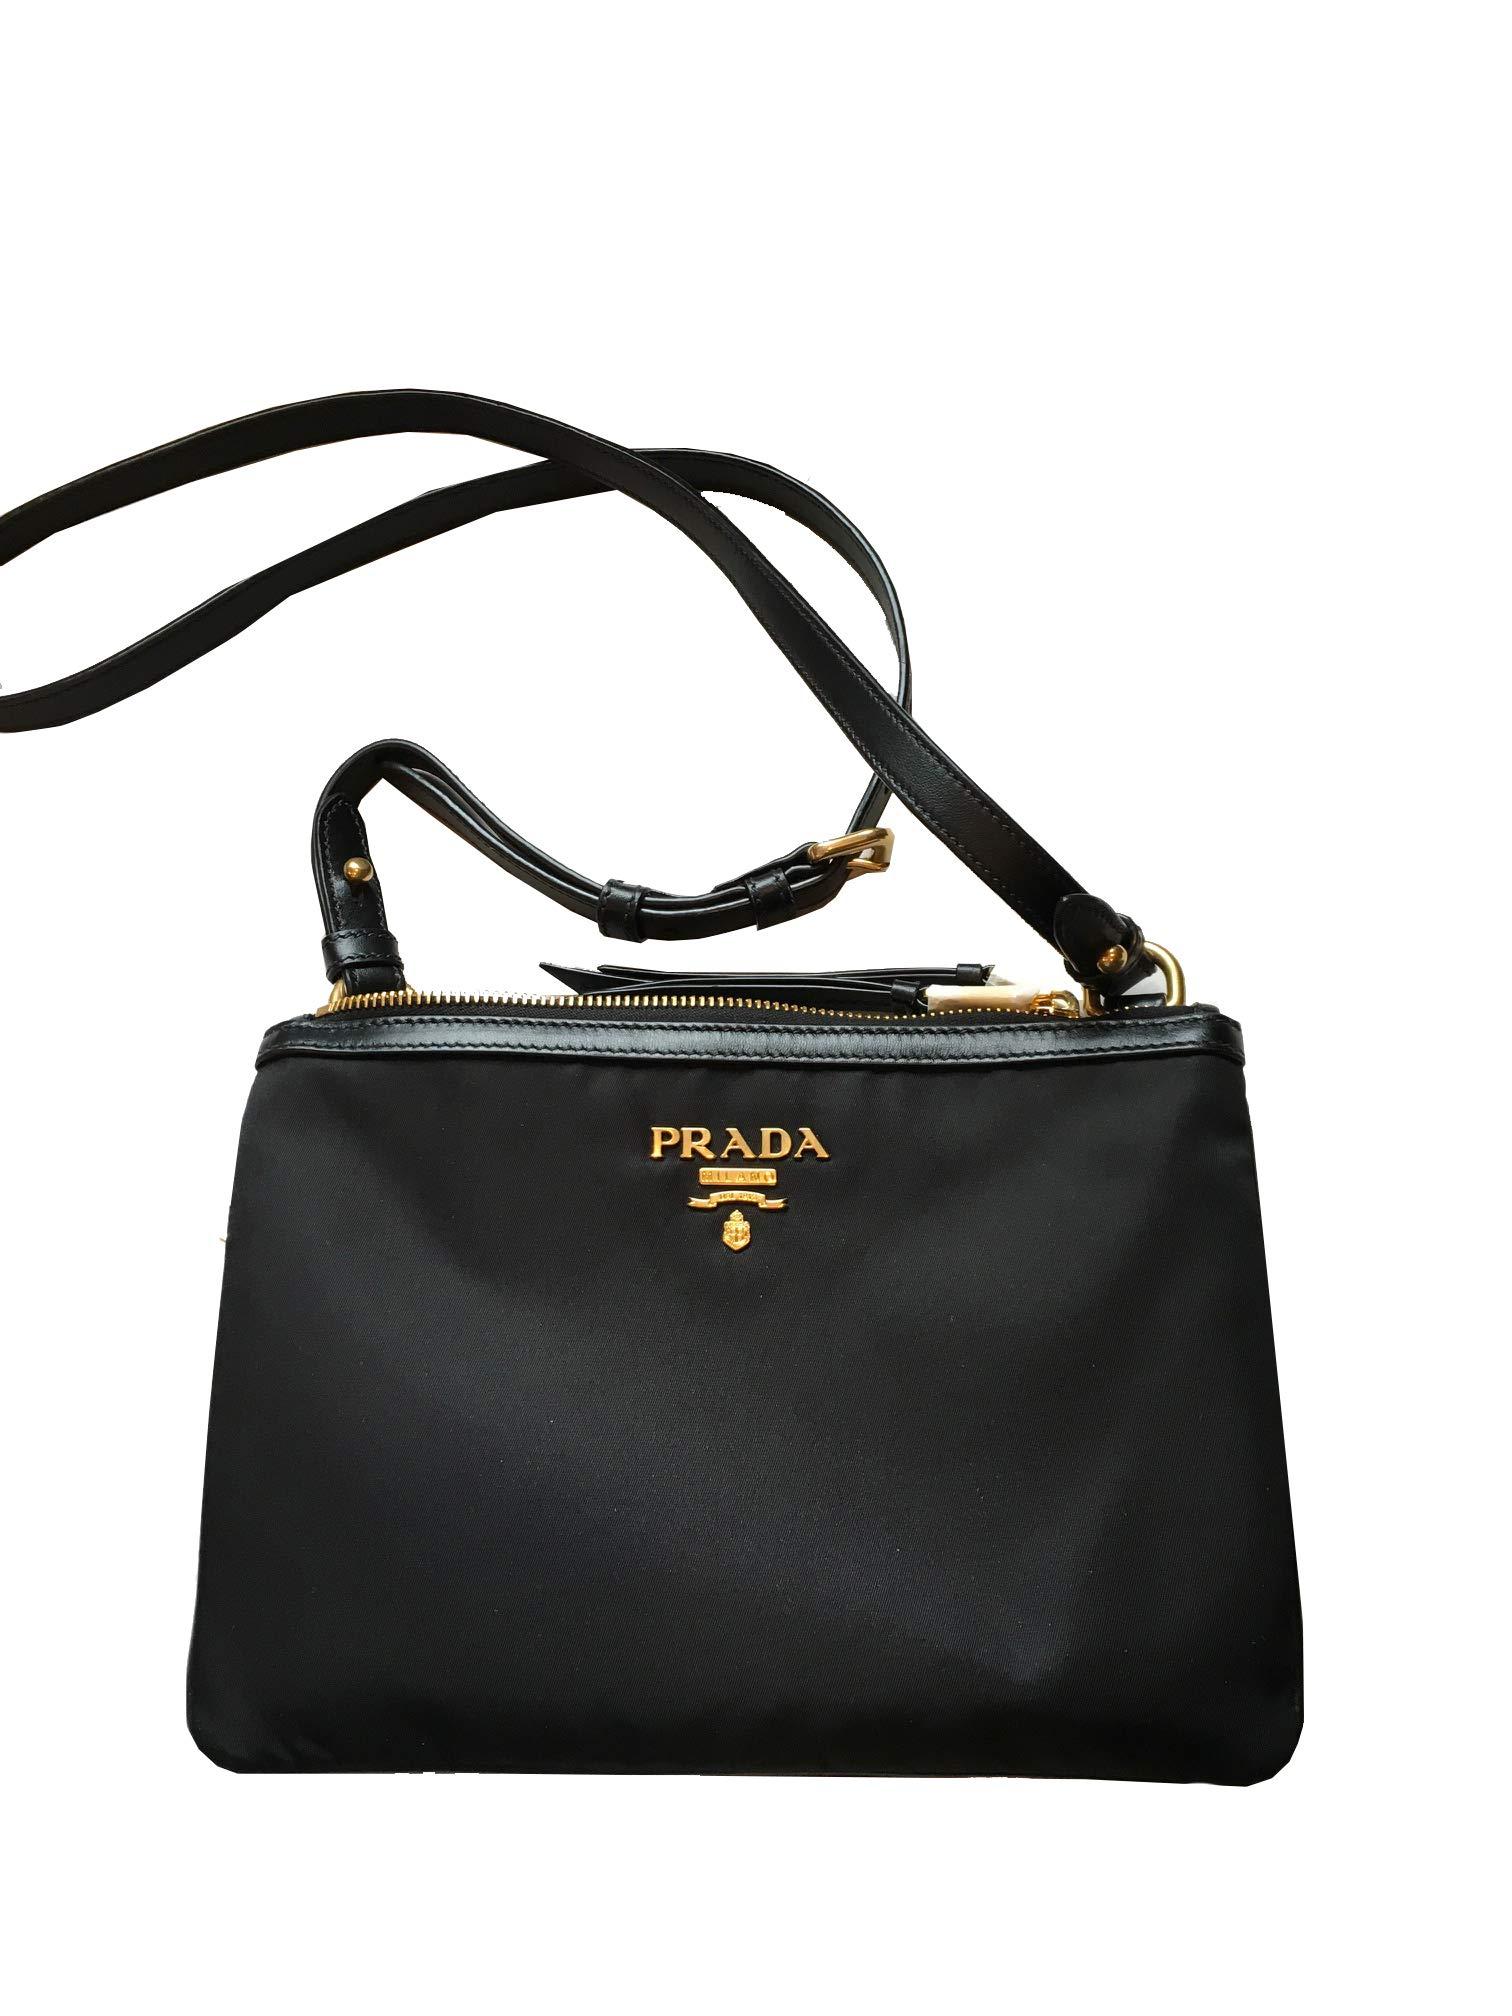 16eea5b099f4 Prada Women s Over The Shoulder Handbag 1bh046 Black Nylon Cross Body Bag